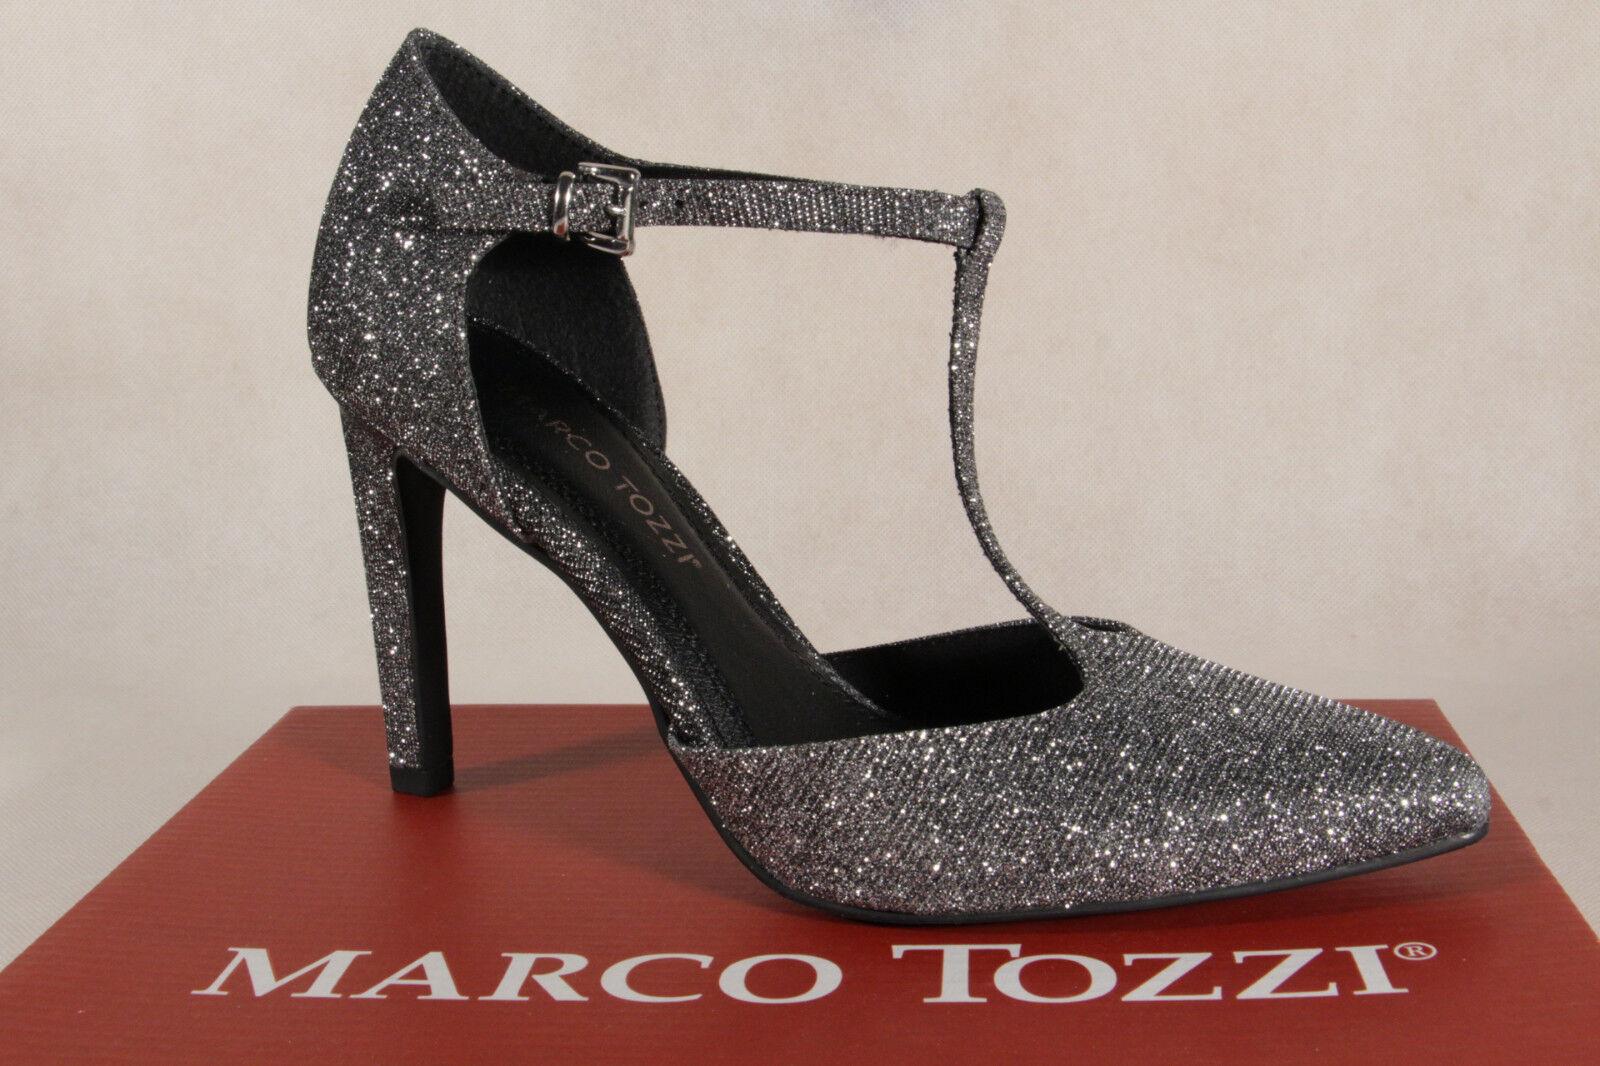 Marco Tozzi Women's Sandals High-Heeled Sandals Pumps 24401 New